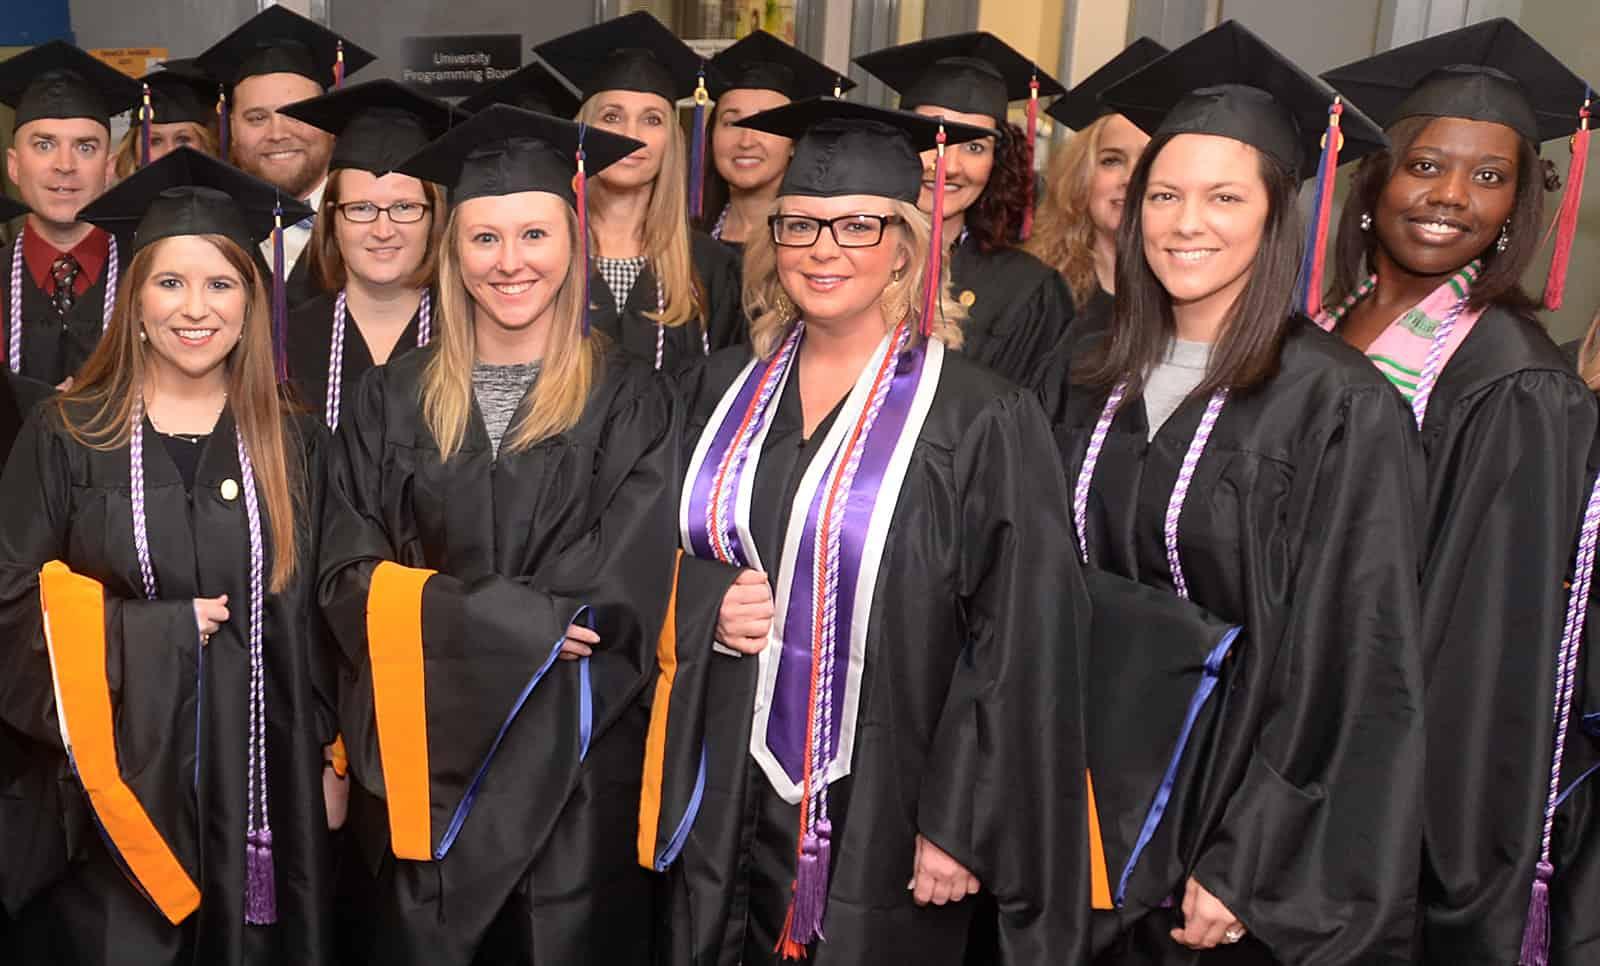 FMU Nursing Pinning Ceremony